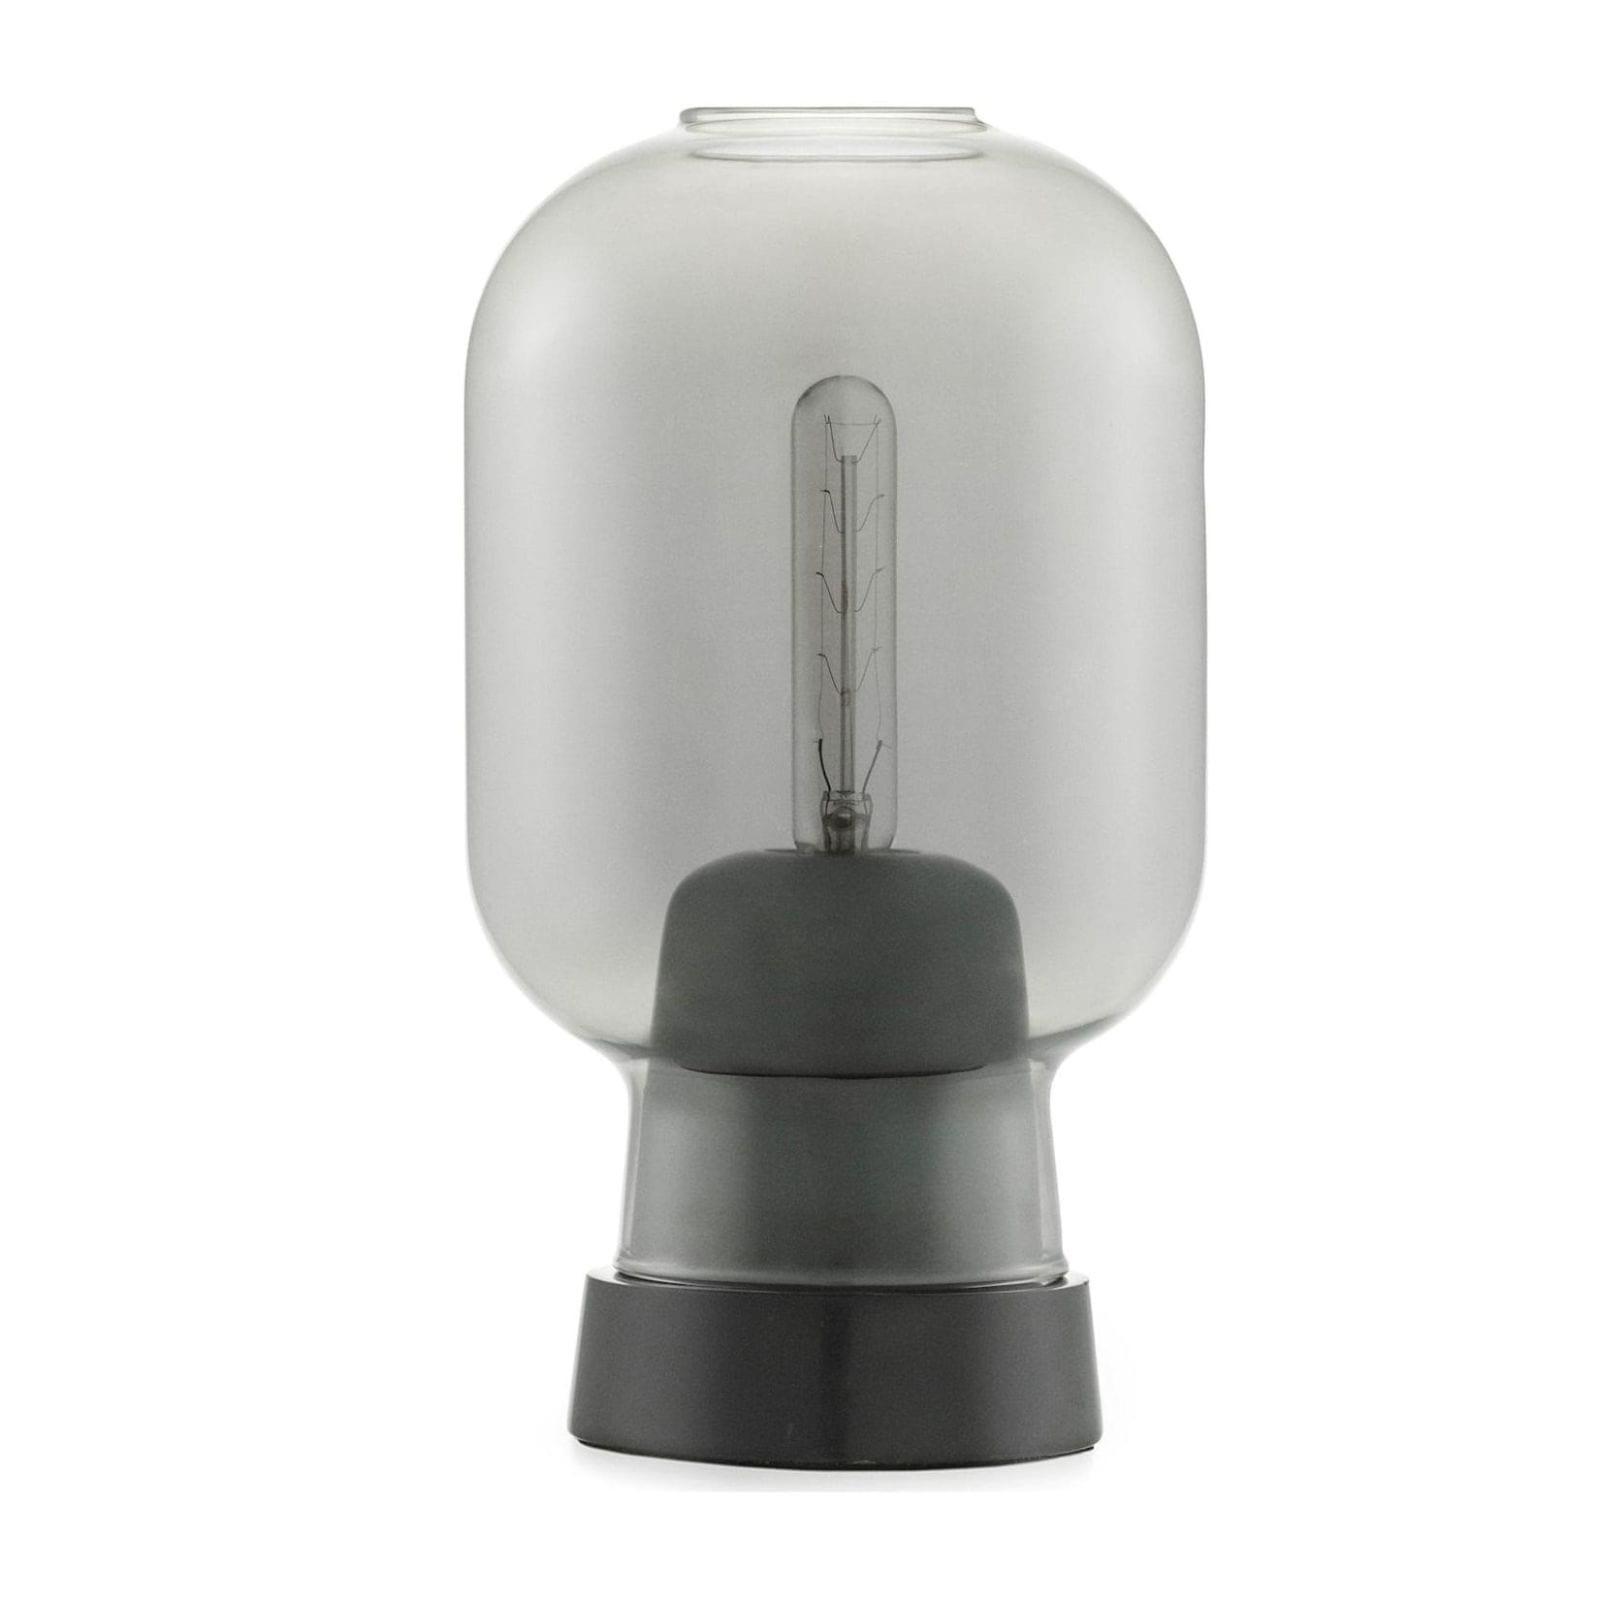 Amp Table Lamp (Smoke / Black) - Normann Copenhagen